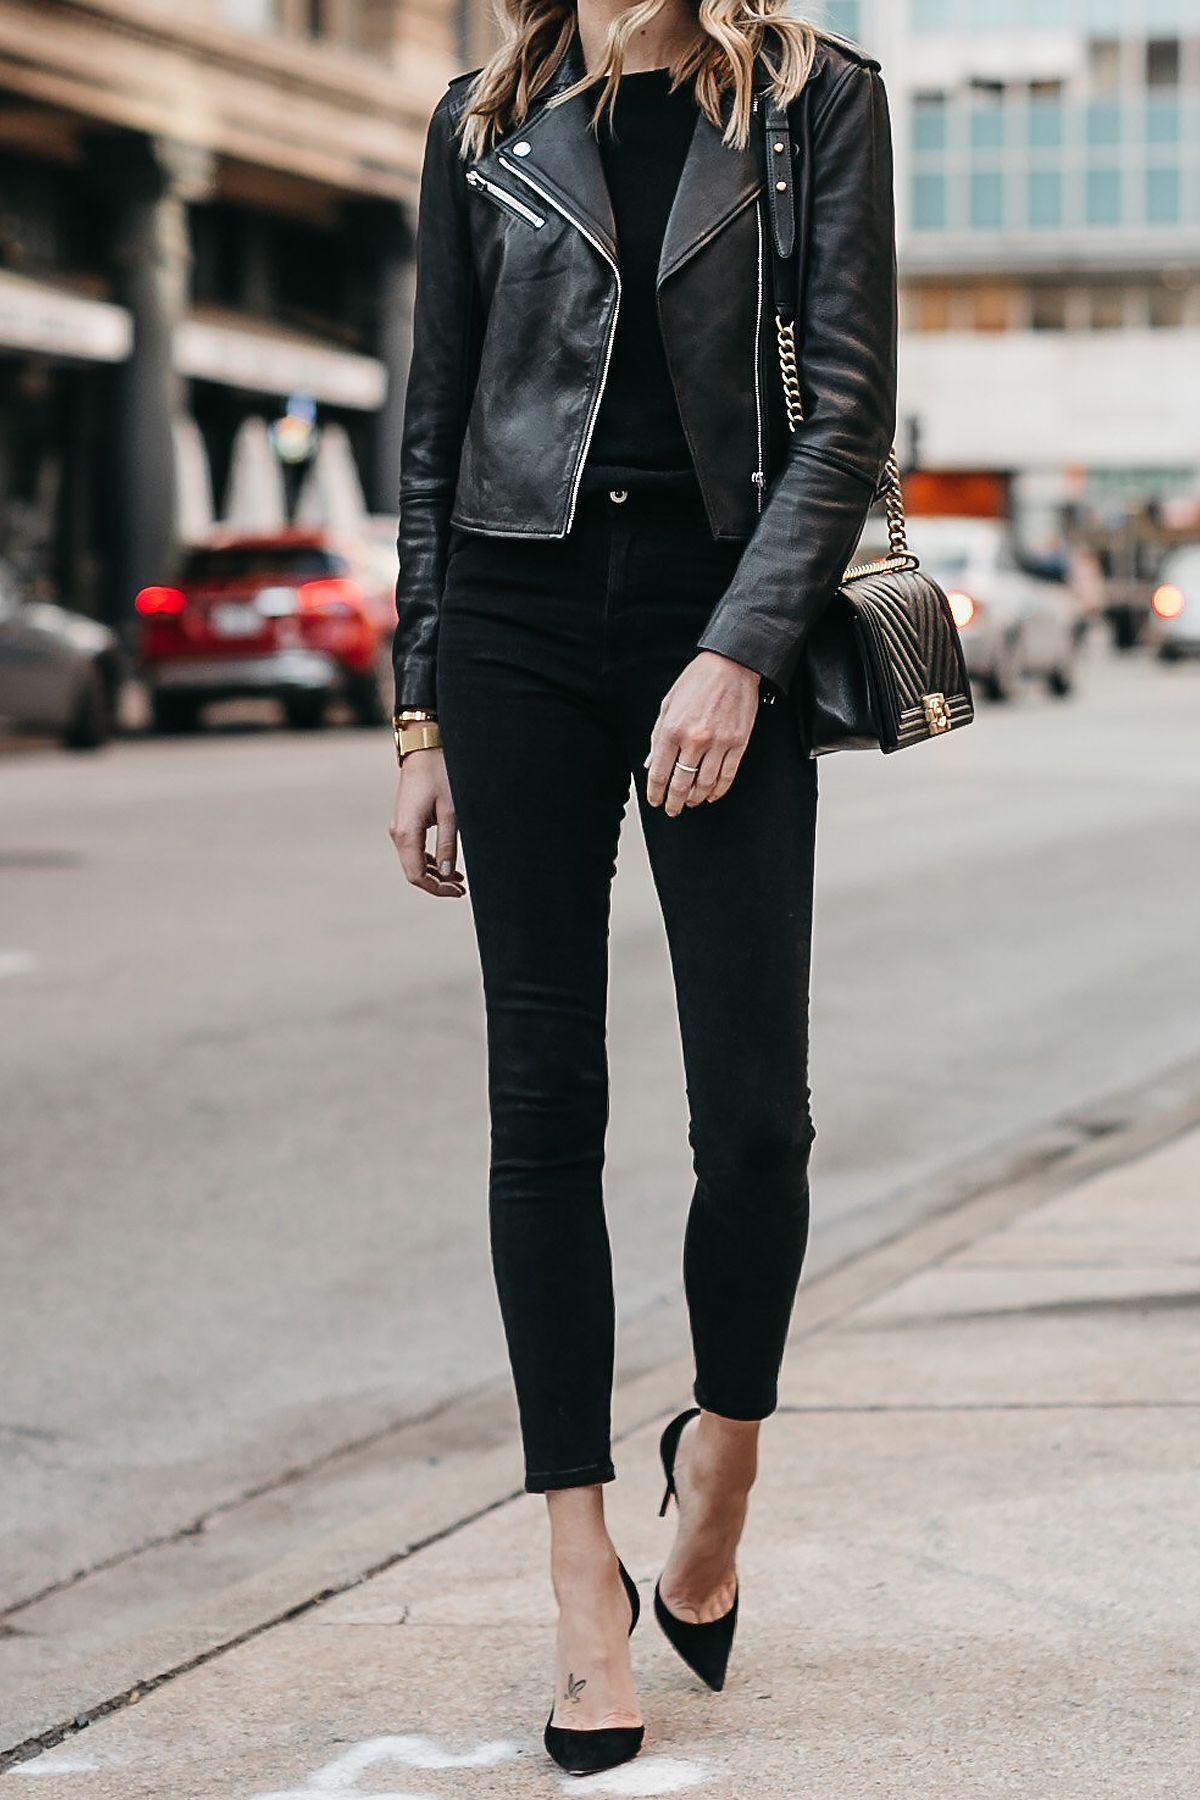 3f5faa004d829 Club Monaco Black Leather Jacket Black Sweater Black Skinny Jeans Black  Pumps Chanel Boy Bag Fashion Jackson Dallas Blogger Fashion Blogger Street  Style